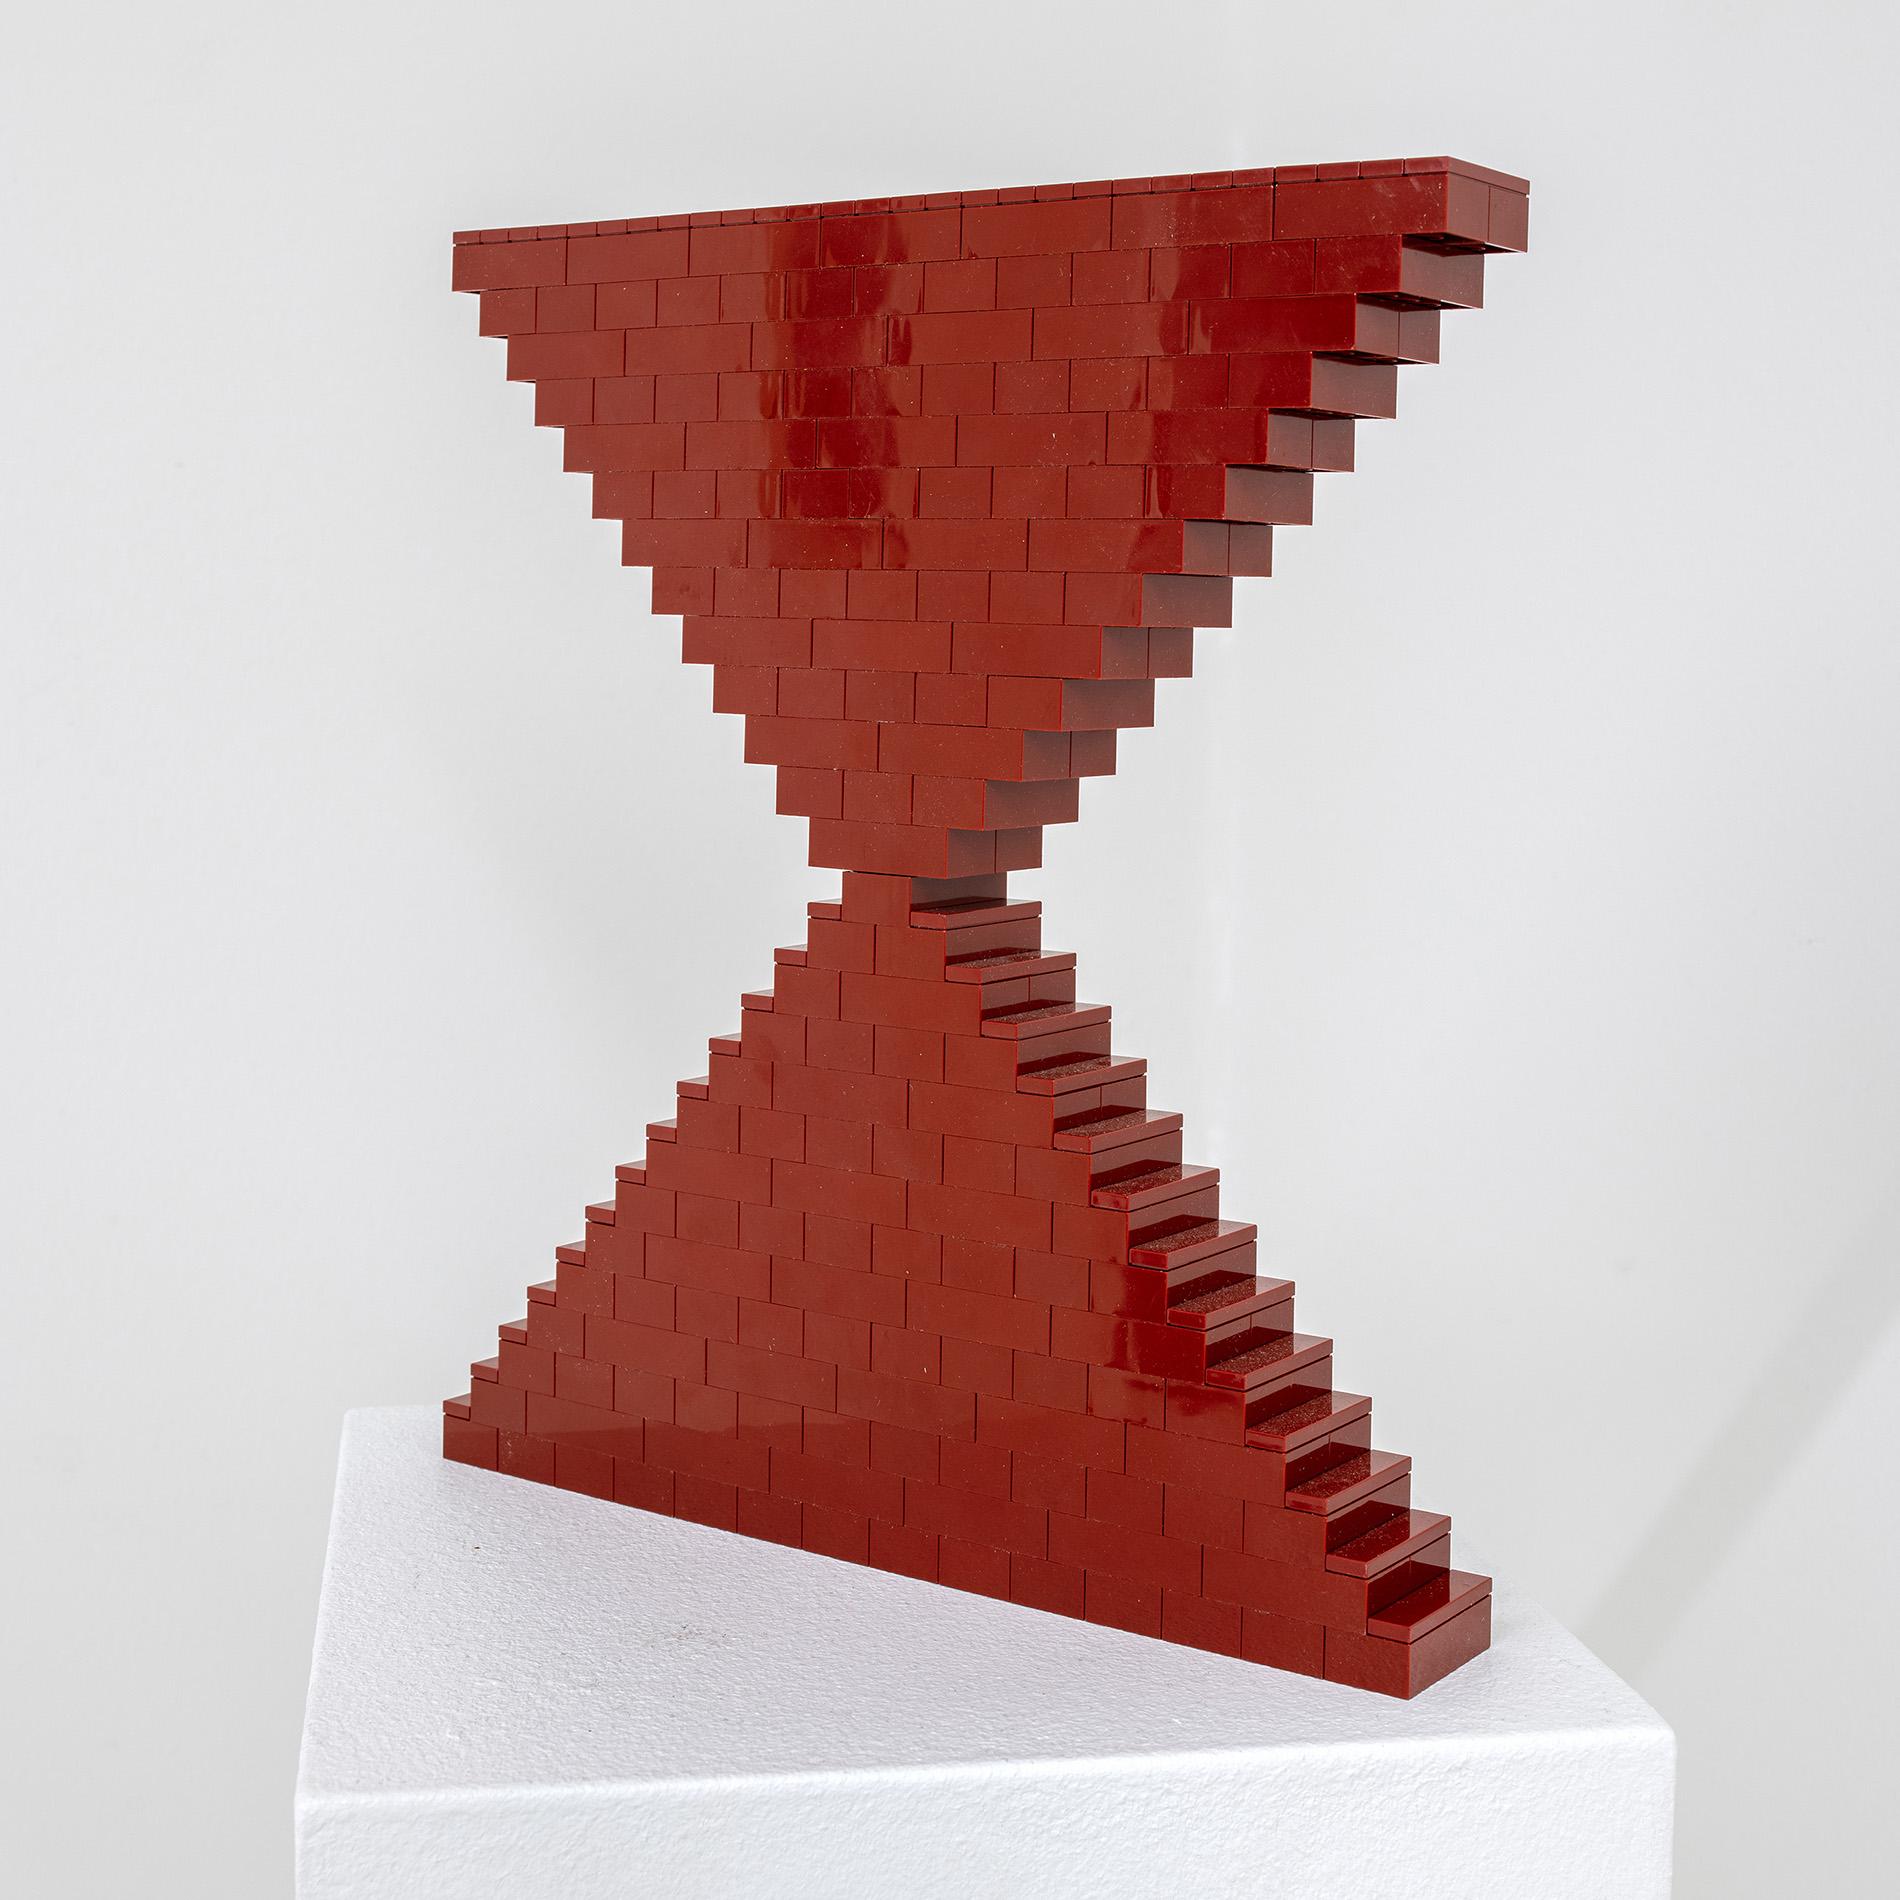 Idris Sevenans | Sculpture Designer (Carl André) 2017